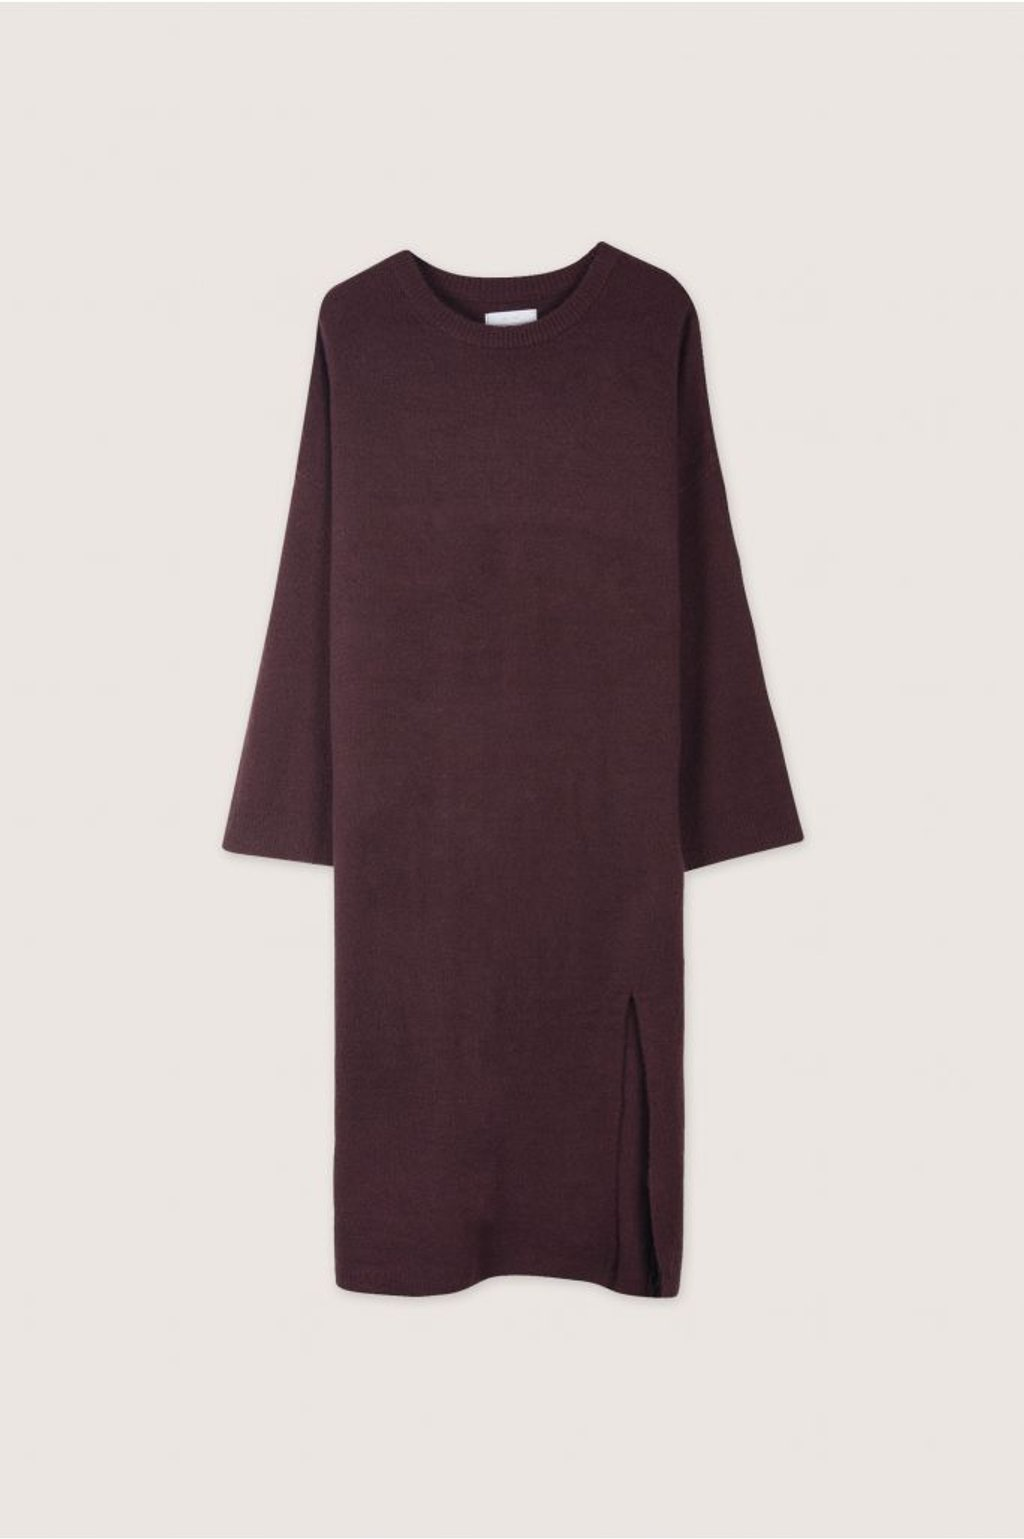 Dress 1648 Burgundy 9